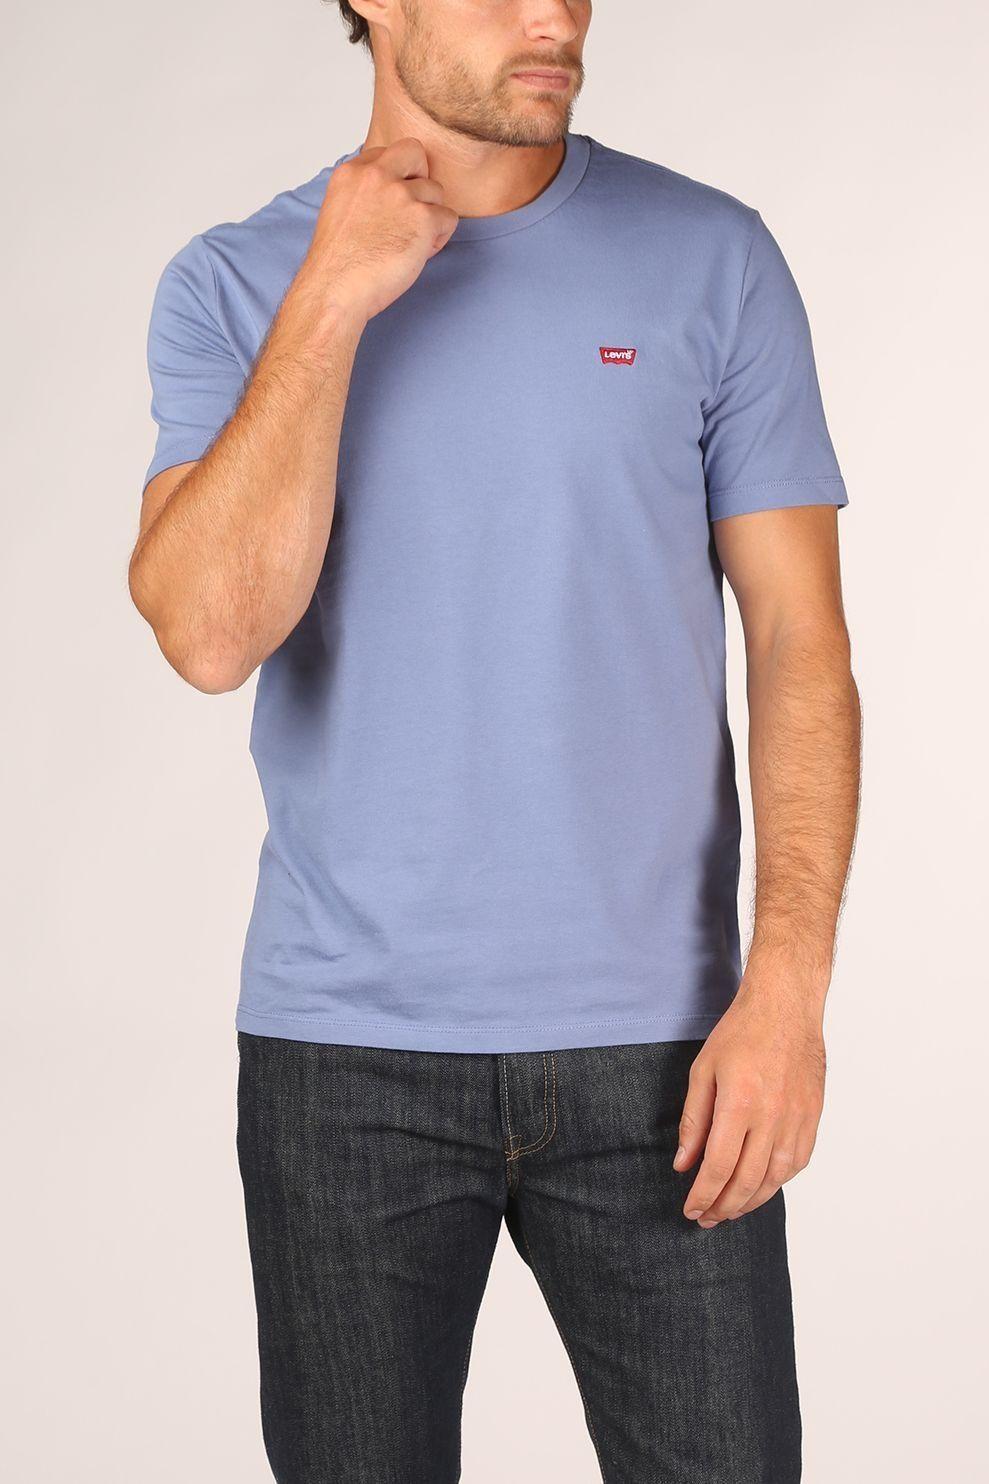 Levi's T-Shirt Ss Original Hm Tee voor heren - Blauw - Maten: XS, S, M, L, XL, XXL